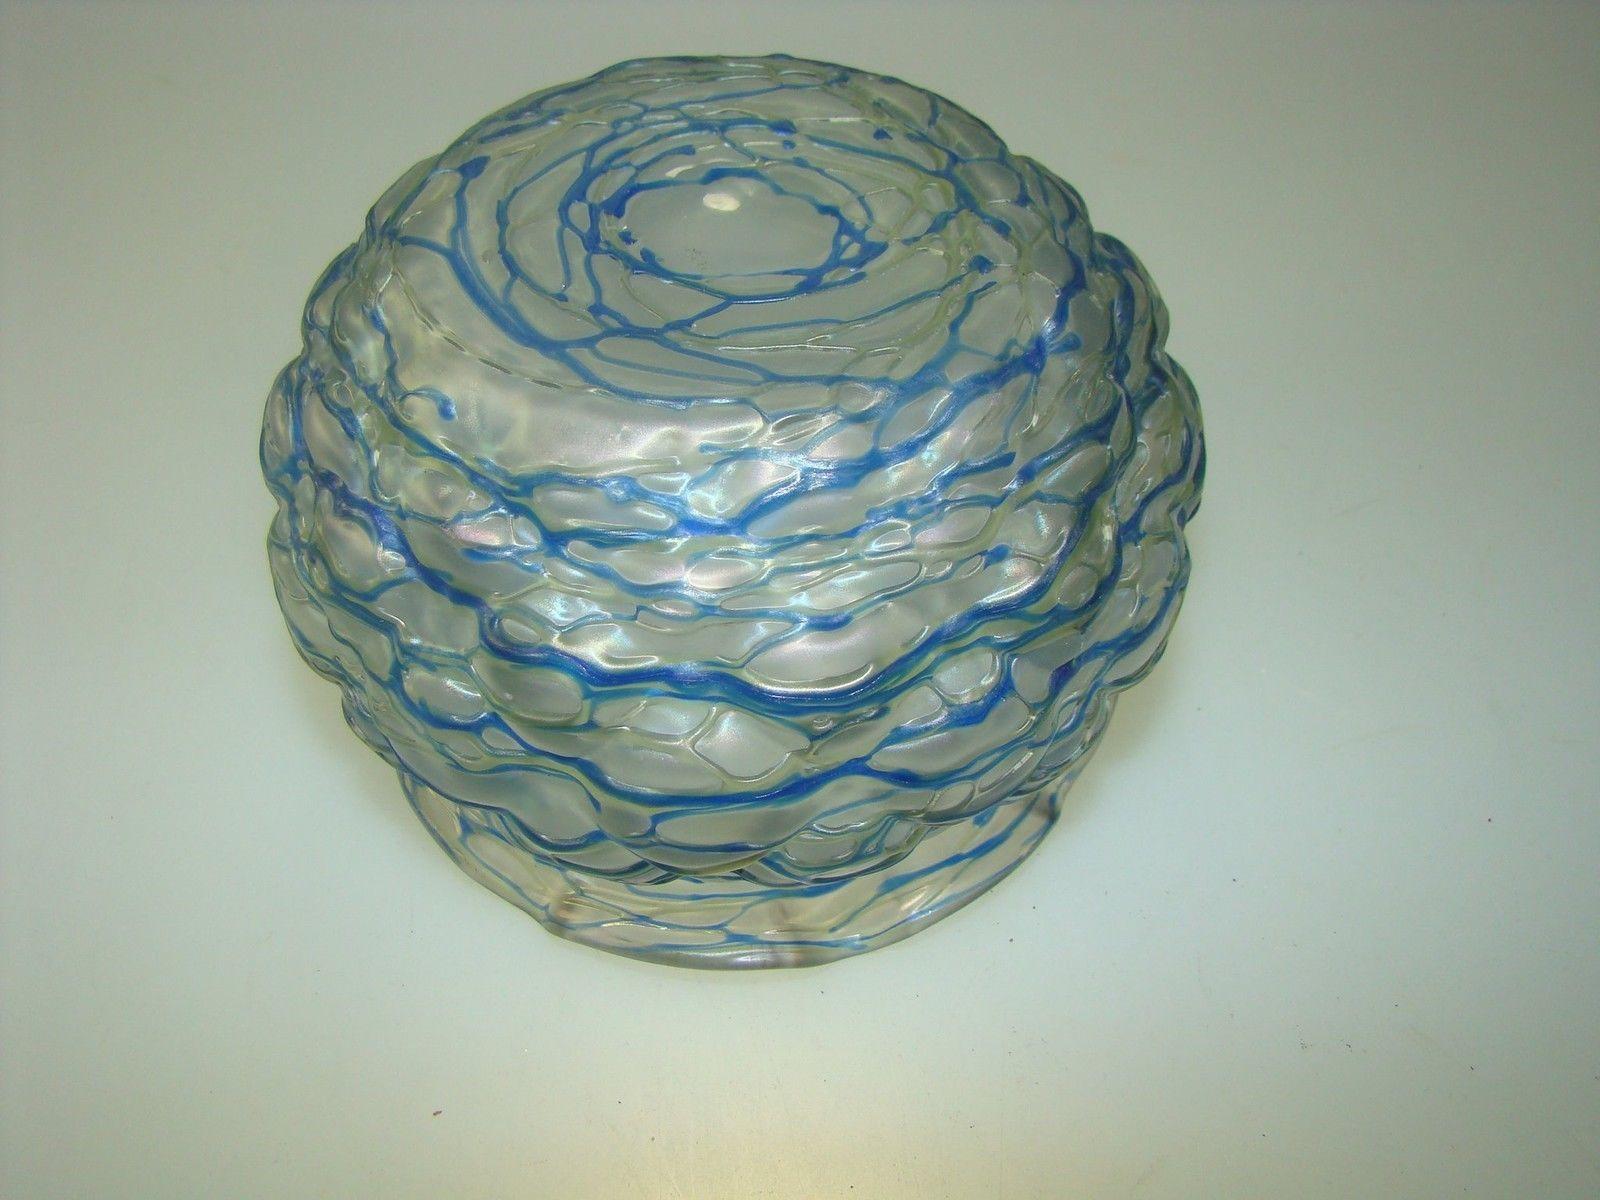 tiffany vase ebay of antique art nouveau vase spiderweb by loetz or palme konig loetz inside antique art nouveau vase spiderweb by loetz or palme konig loetz tiffany era 1